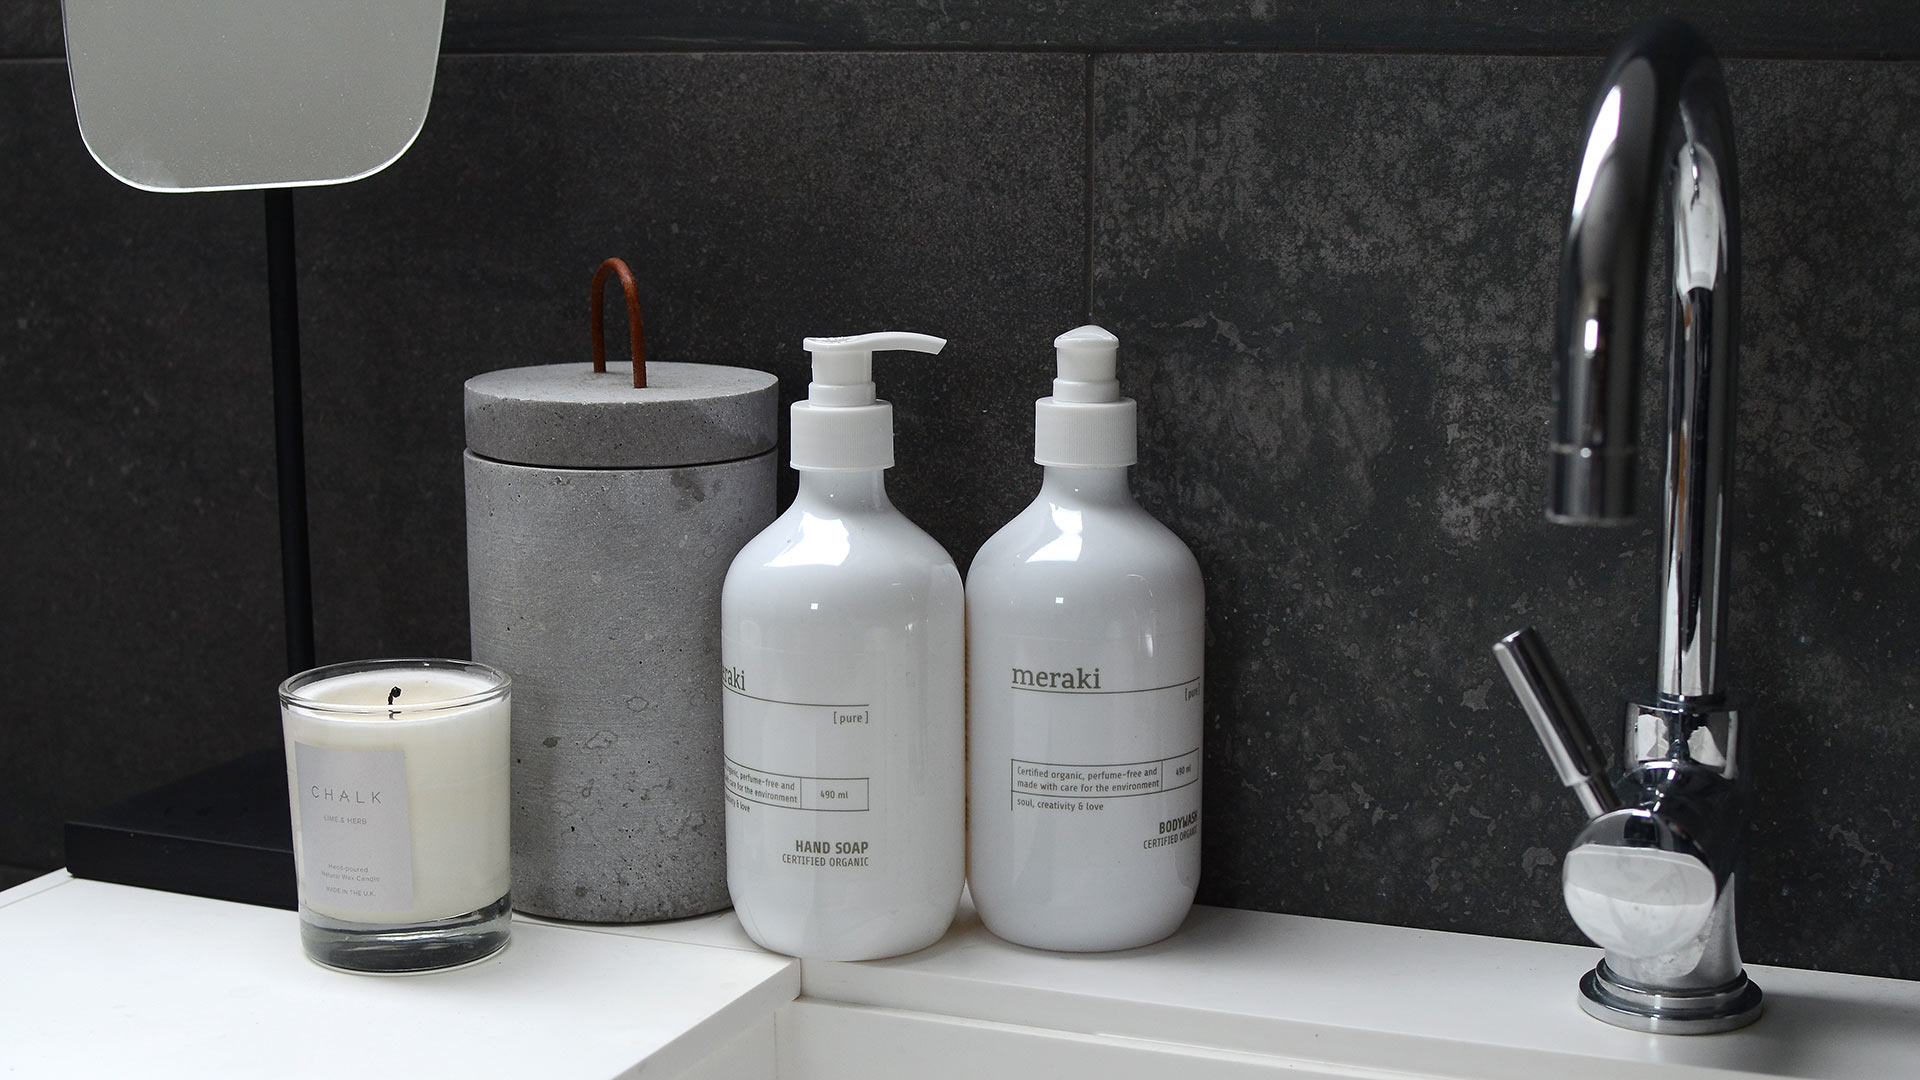 meraki-organic-toiletries